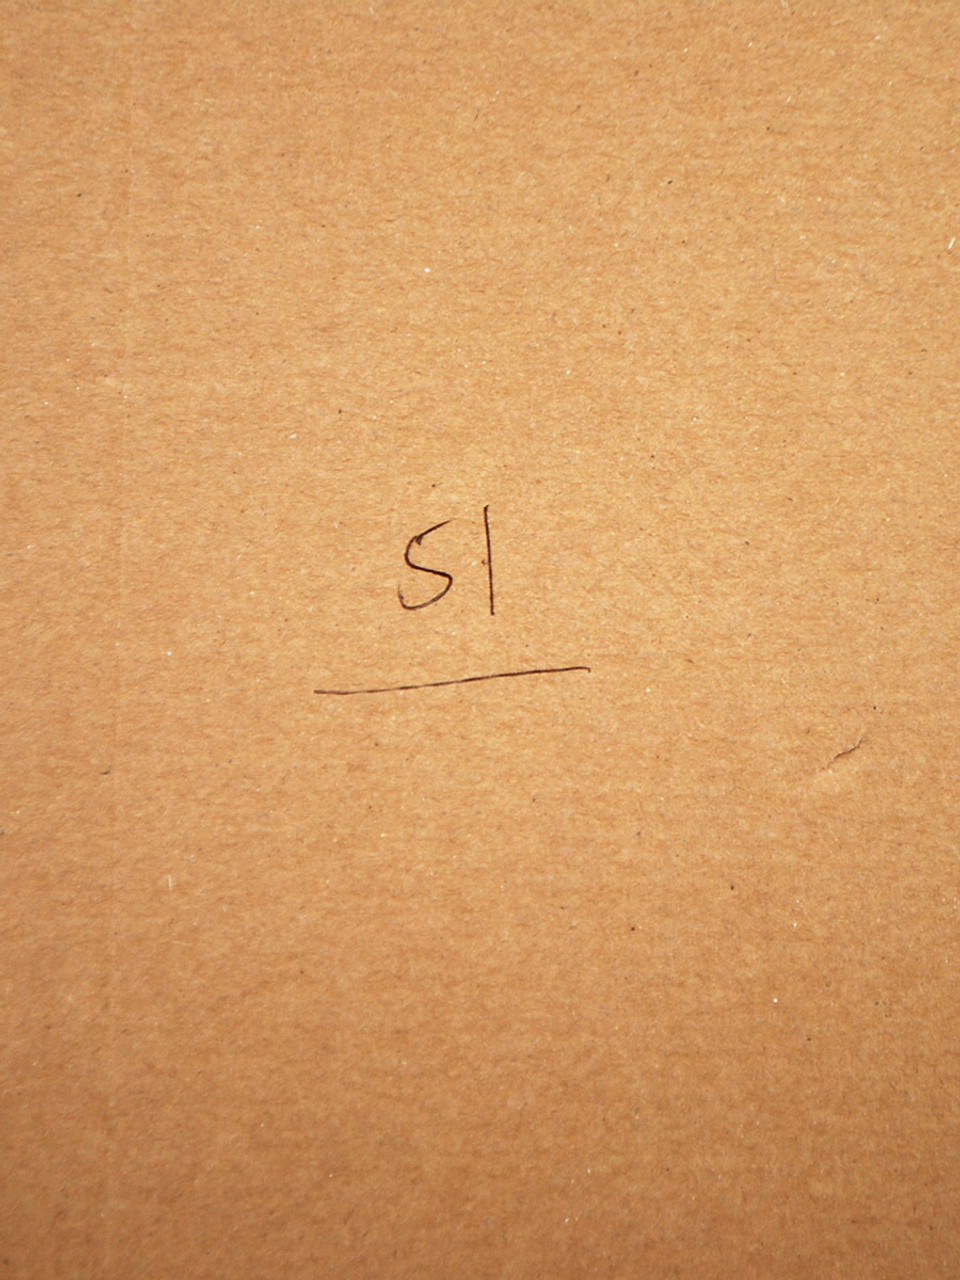 "Magdalena Kaczan, Joe Hill ""Horns"" Signed Limited Artwork Portfolio No. 51 of 125 [Very Fine]"